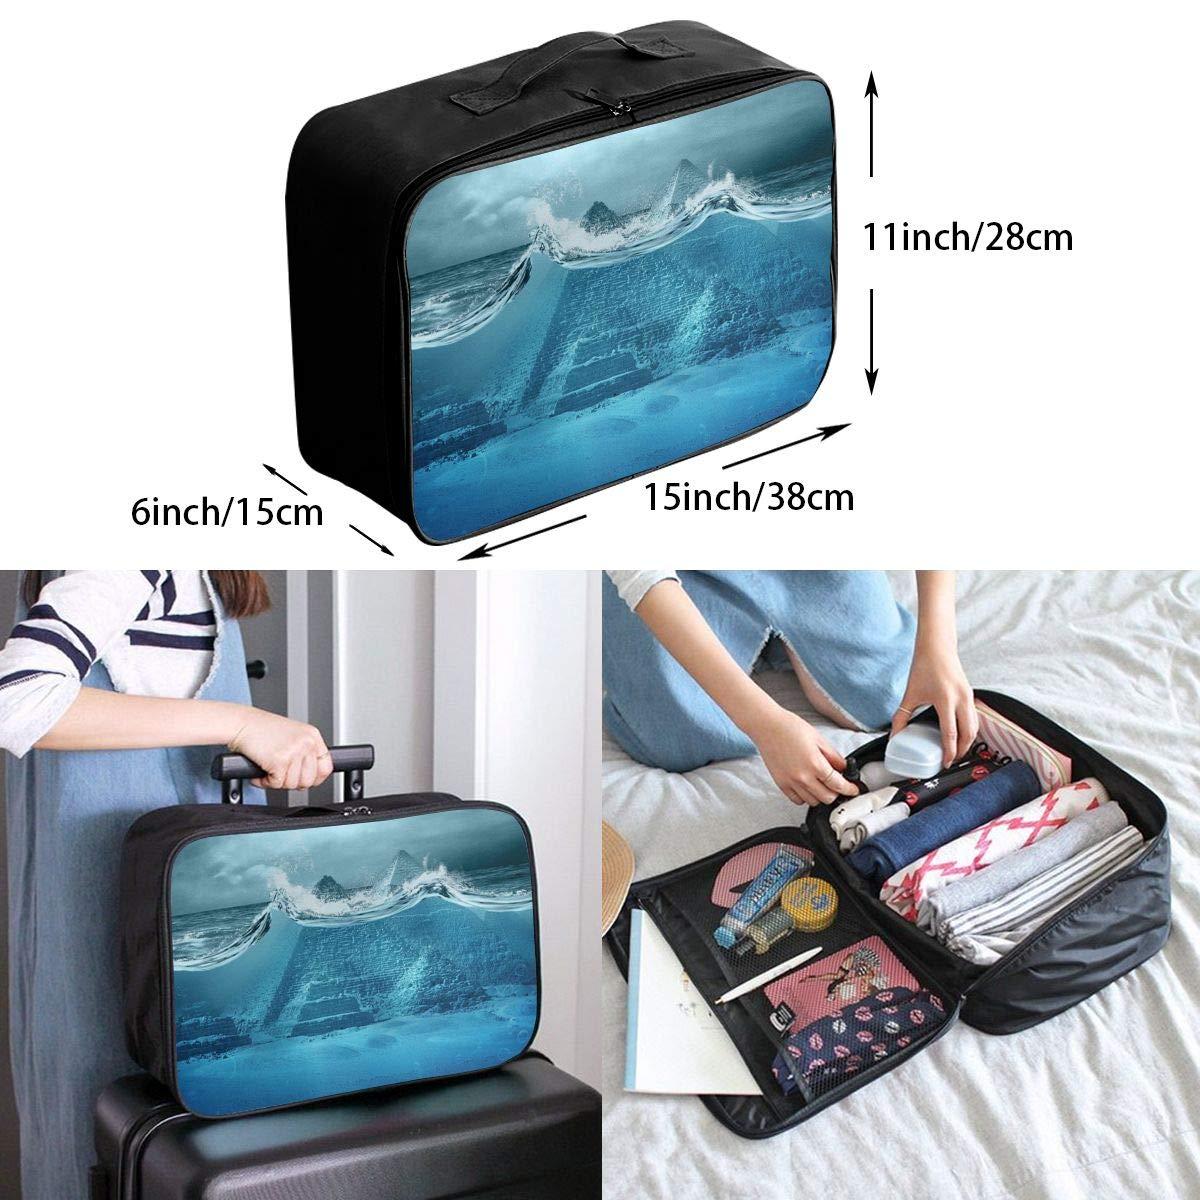 Travel Luggage Duffle Bag Lightweight Portable Handbag Underwater Pyramids Of Egypt Large Capacity Waterproof Foldable Storage Tote